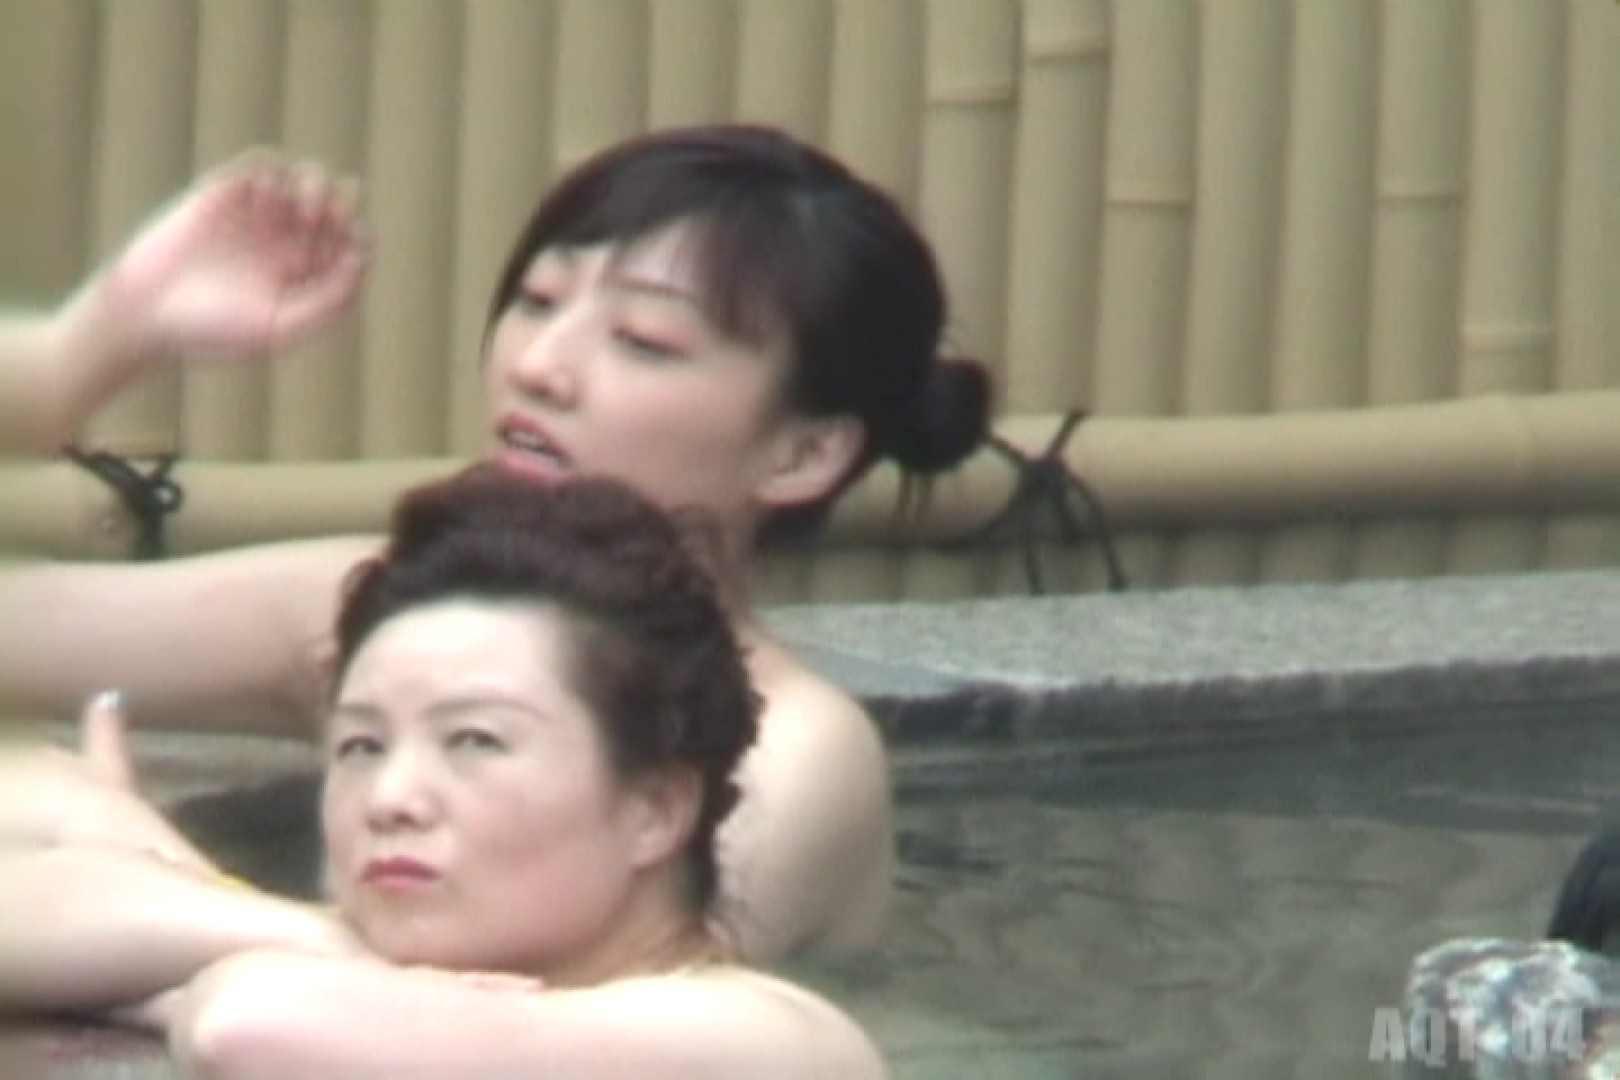 Aquaな露天風呂Vol.743 OLセックス  108画像 45